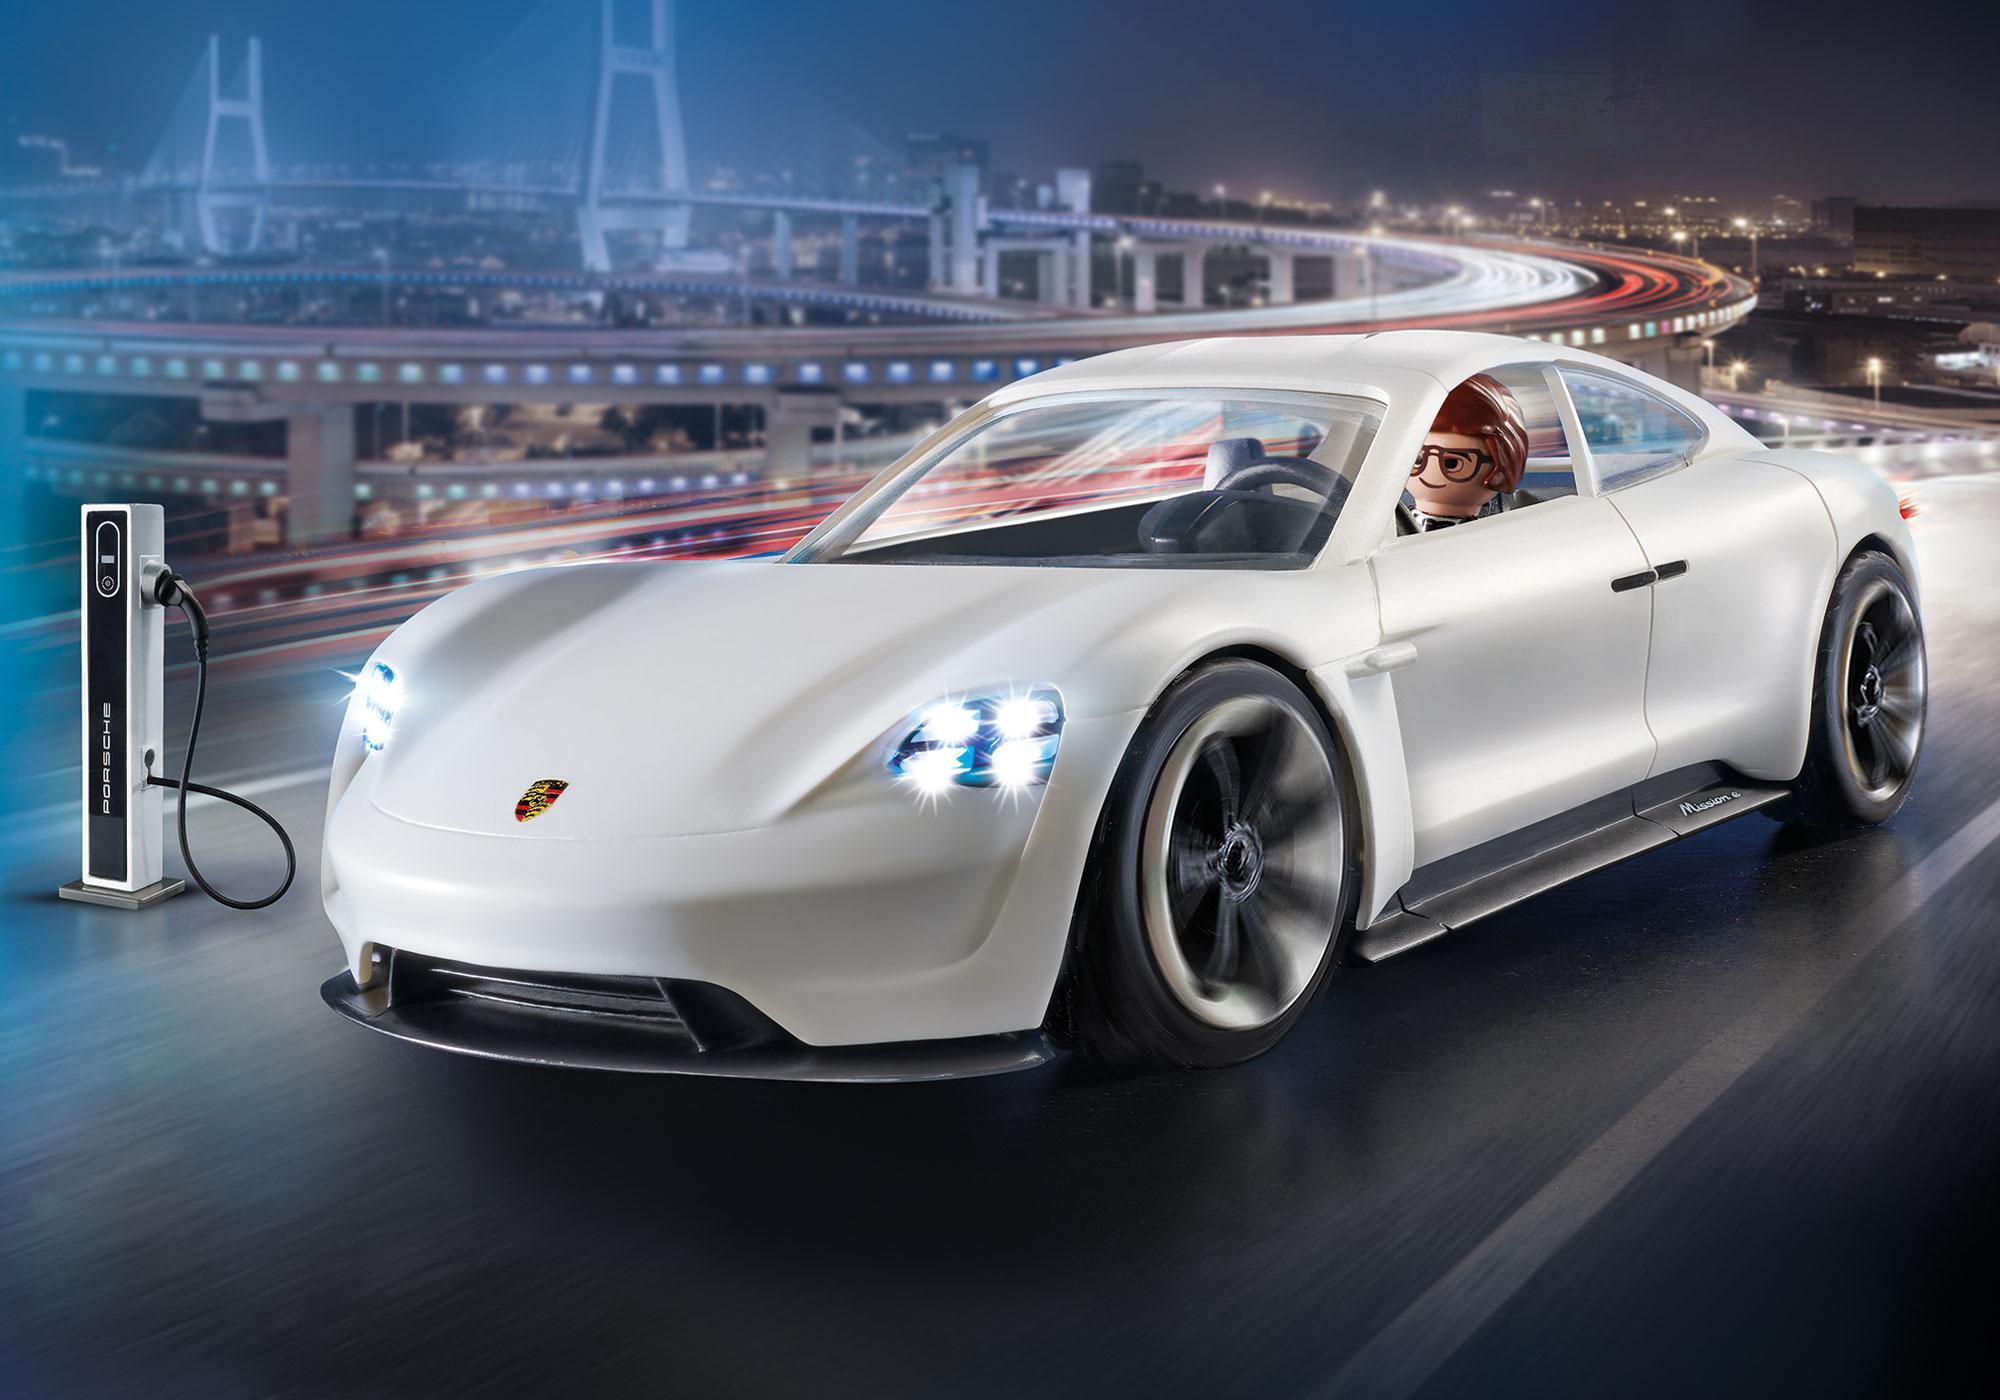 http://media.playmobil.com/i/playmobil/70078_product_detail/PLAYMOBIL: THE MOVIE Porsche Mission E y Rex Dasher